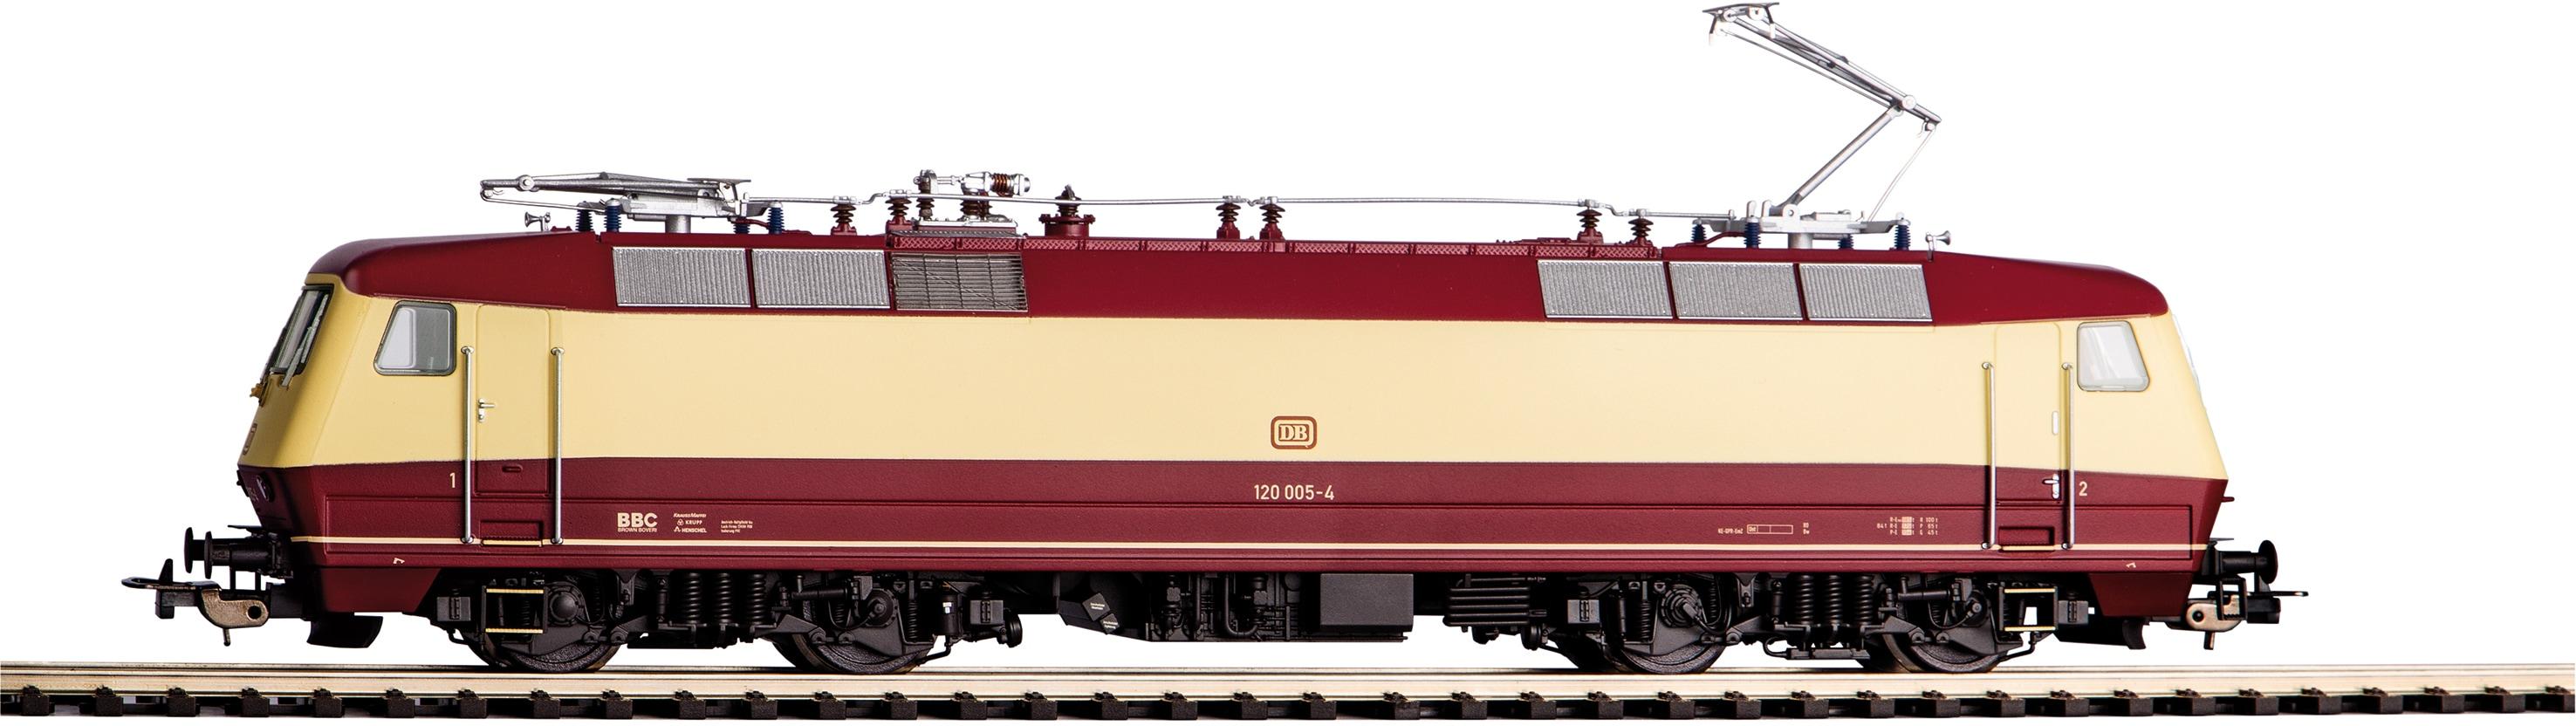 PIKO Elektrolokomotive 120 005-4 DB IV, (51320) bunt Kinder Loks Wägen Modelleisenbahnen Autos, Eisenbahn Modellbau